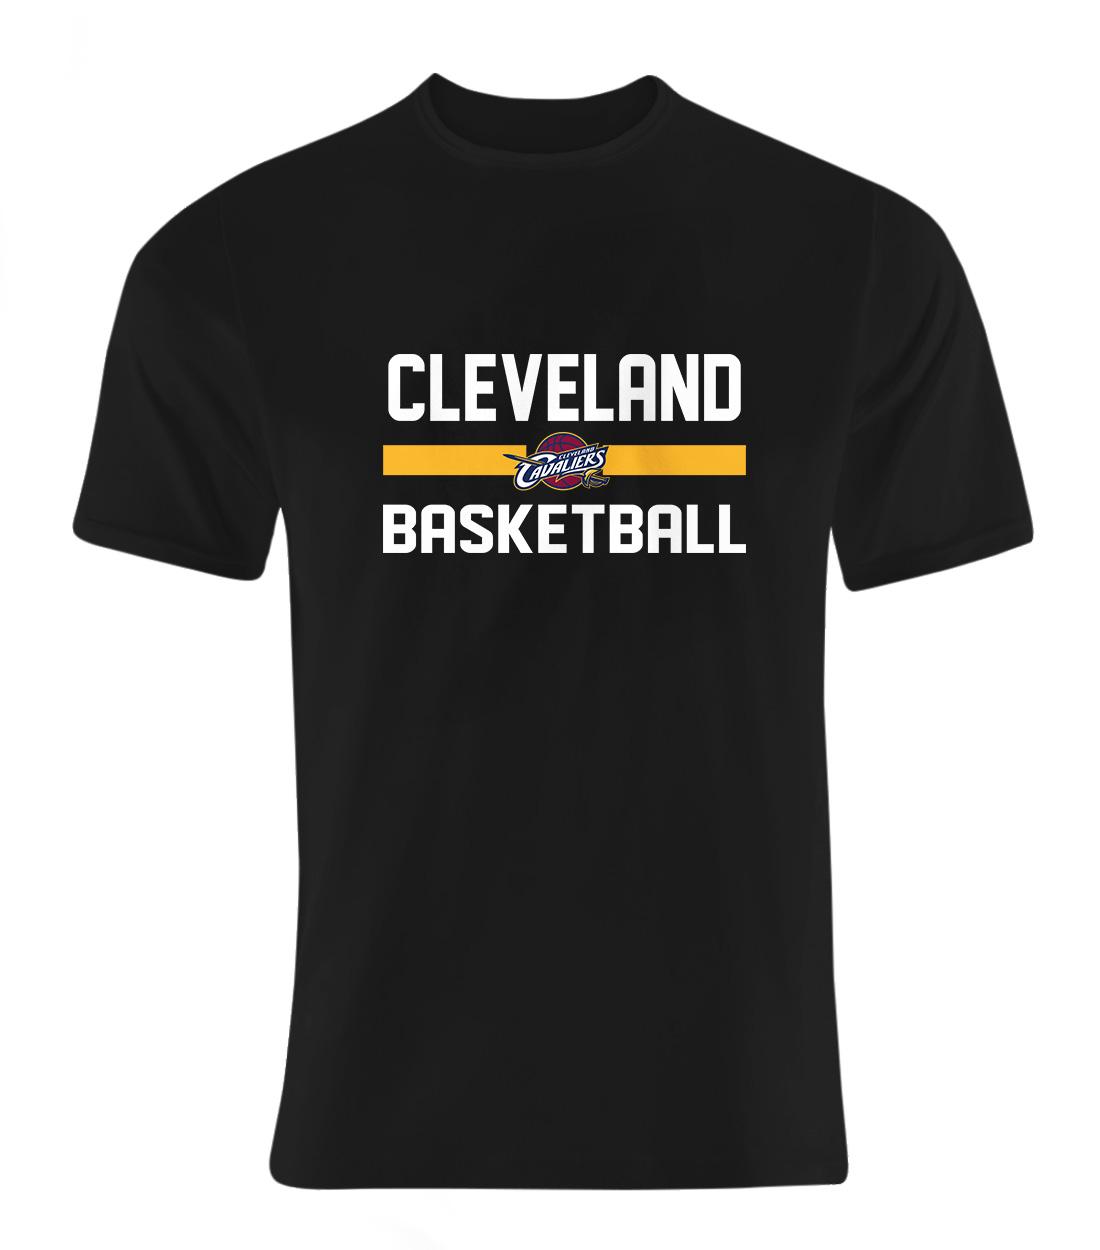 Cleveland Basketball Tshirt (TSH-BLC-NP-66-NBA-CLE-BASKETBALL)